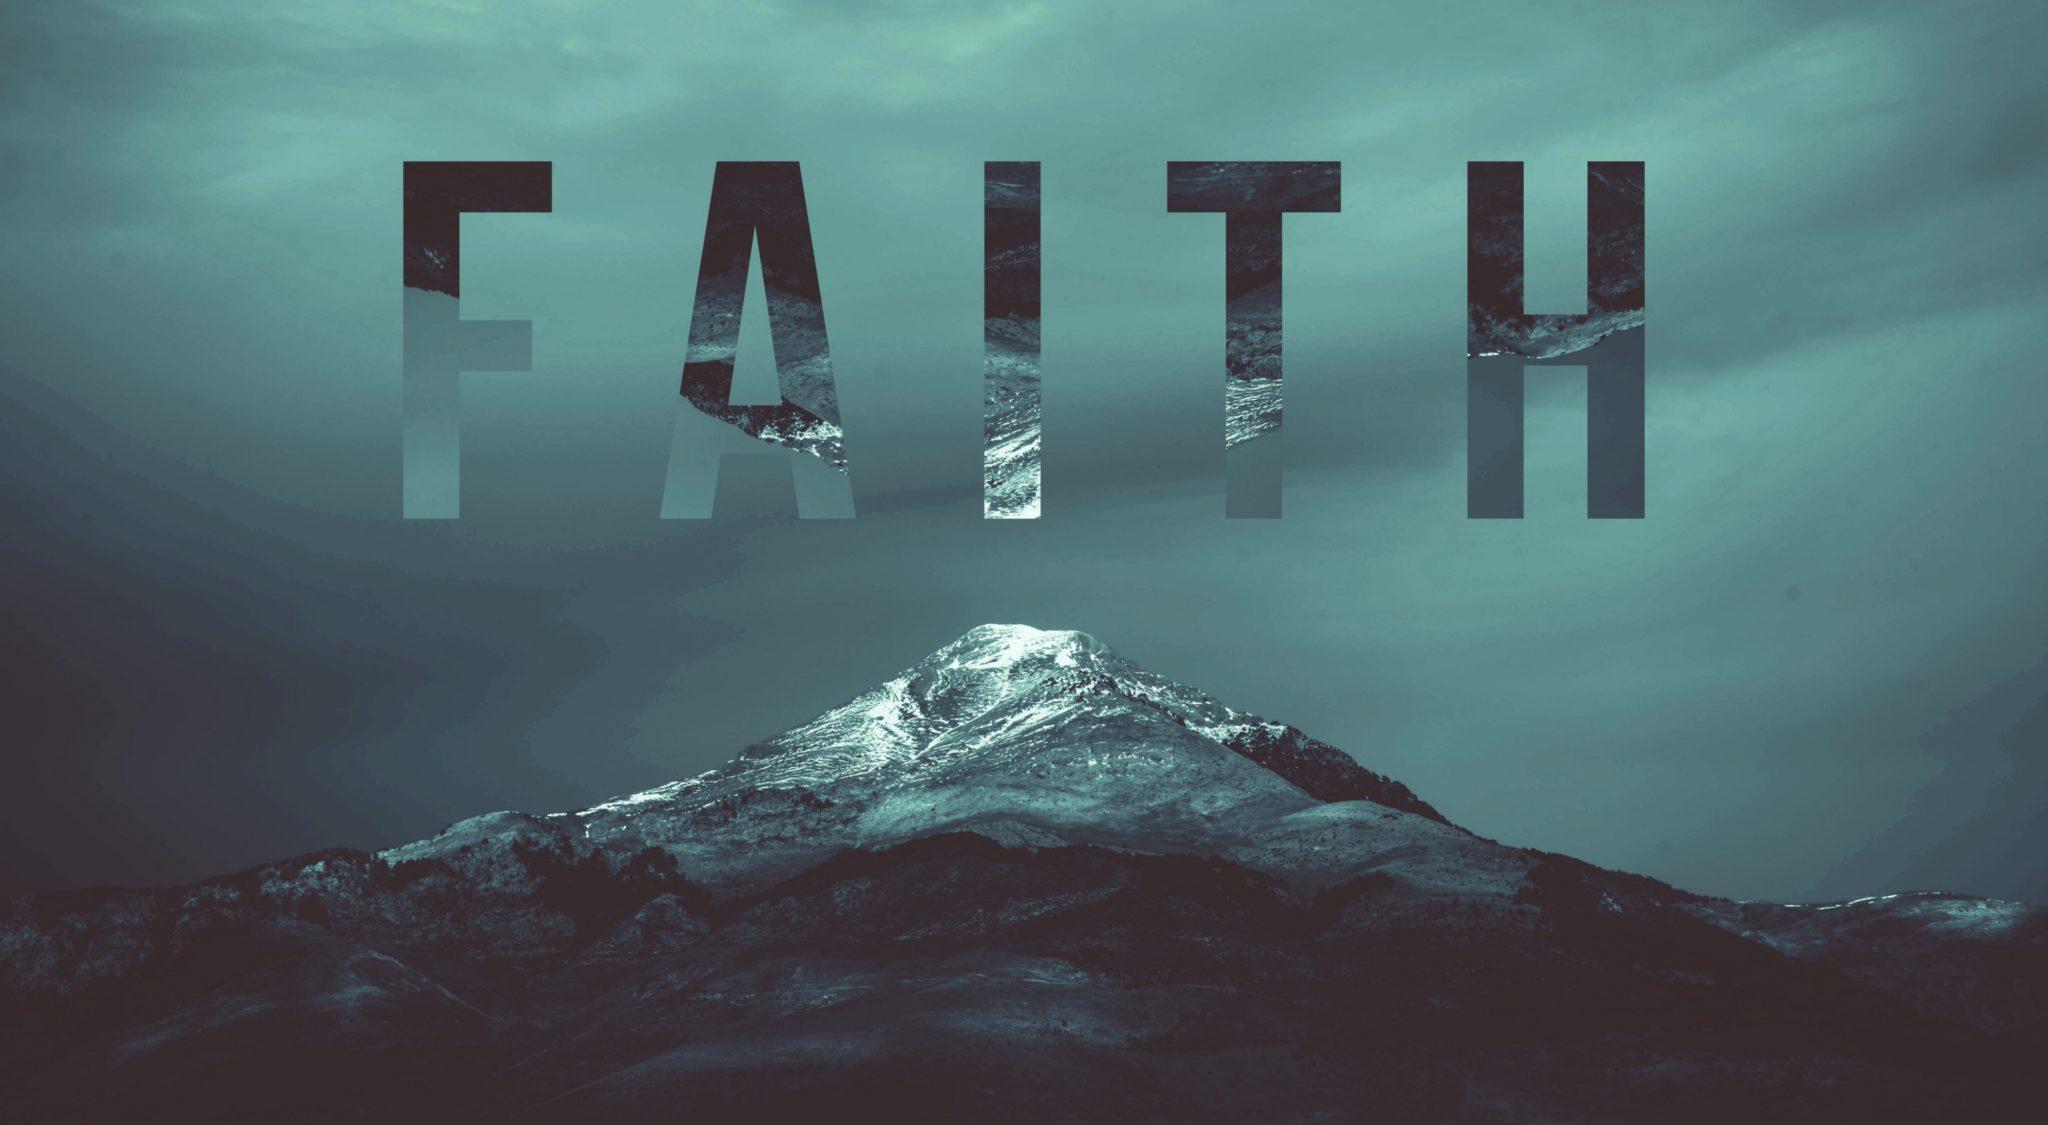 H πίστη στον Θεό με αφορμή το Πάσχα